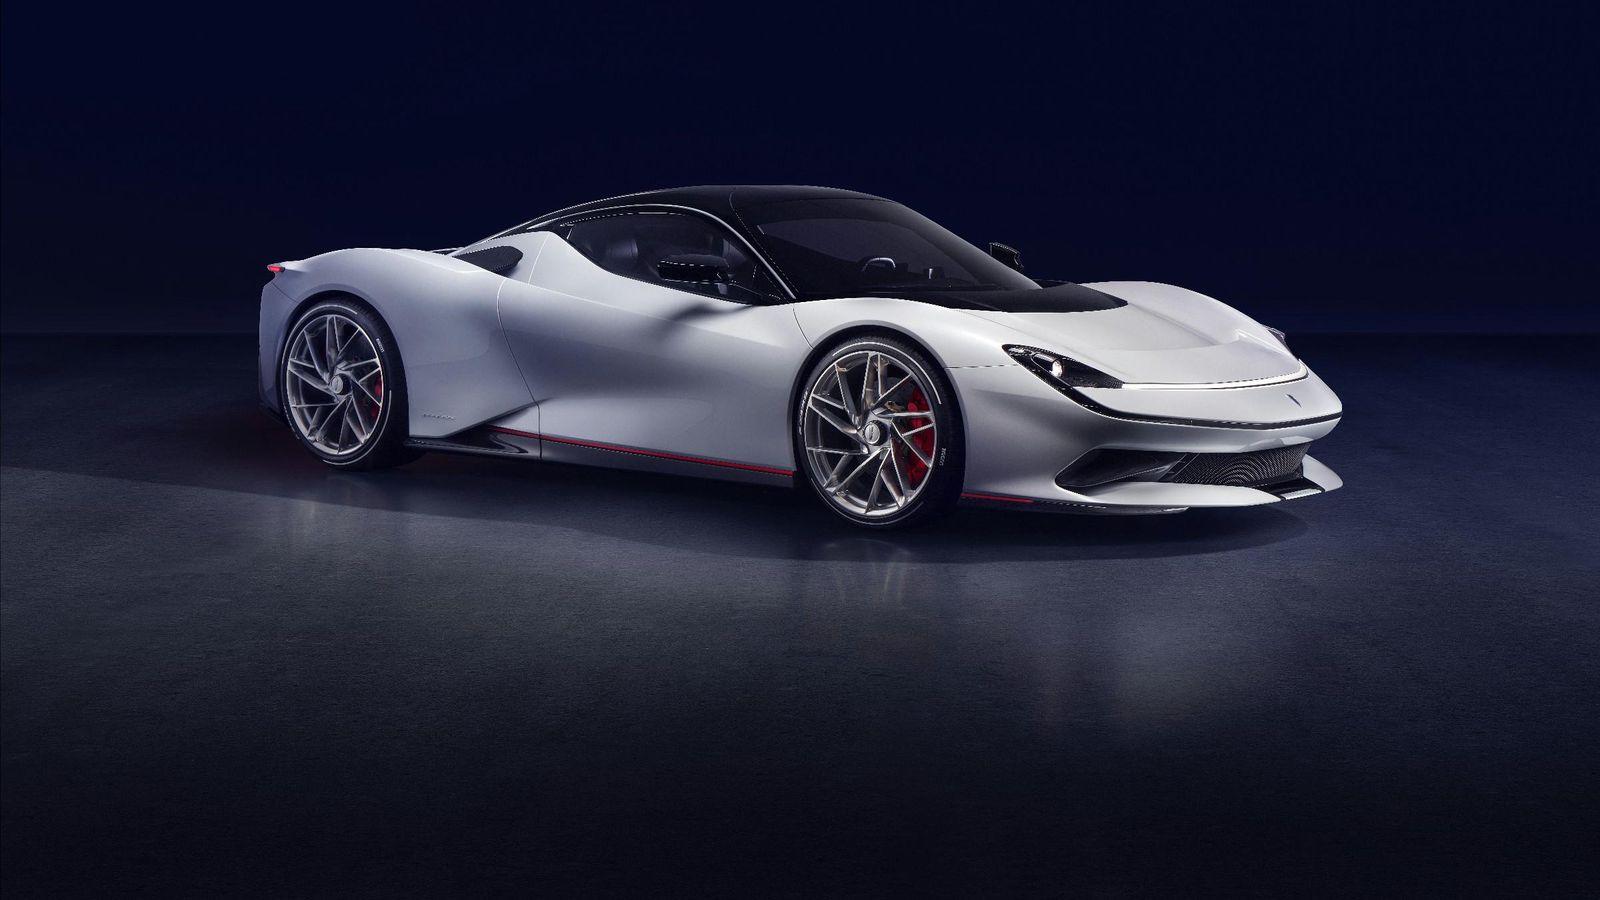 Awe-Inspiring Electric Hypercar $2.5 Million Pininfarina Battista, Faster Than a Fighter Jet Unveiled